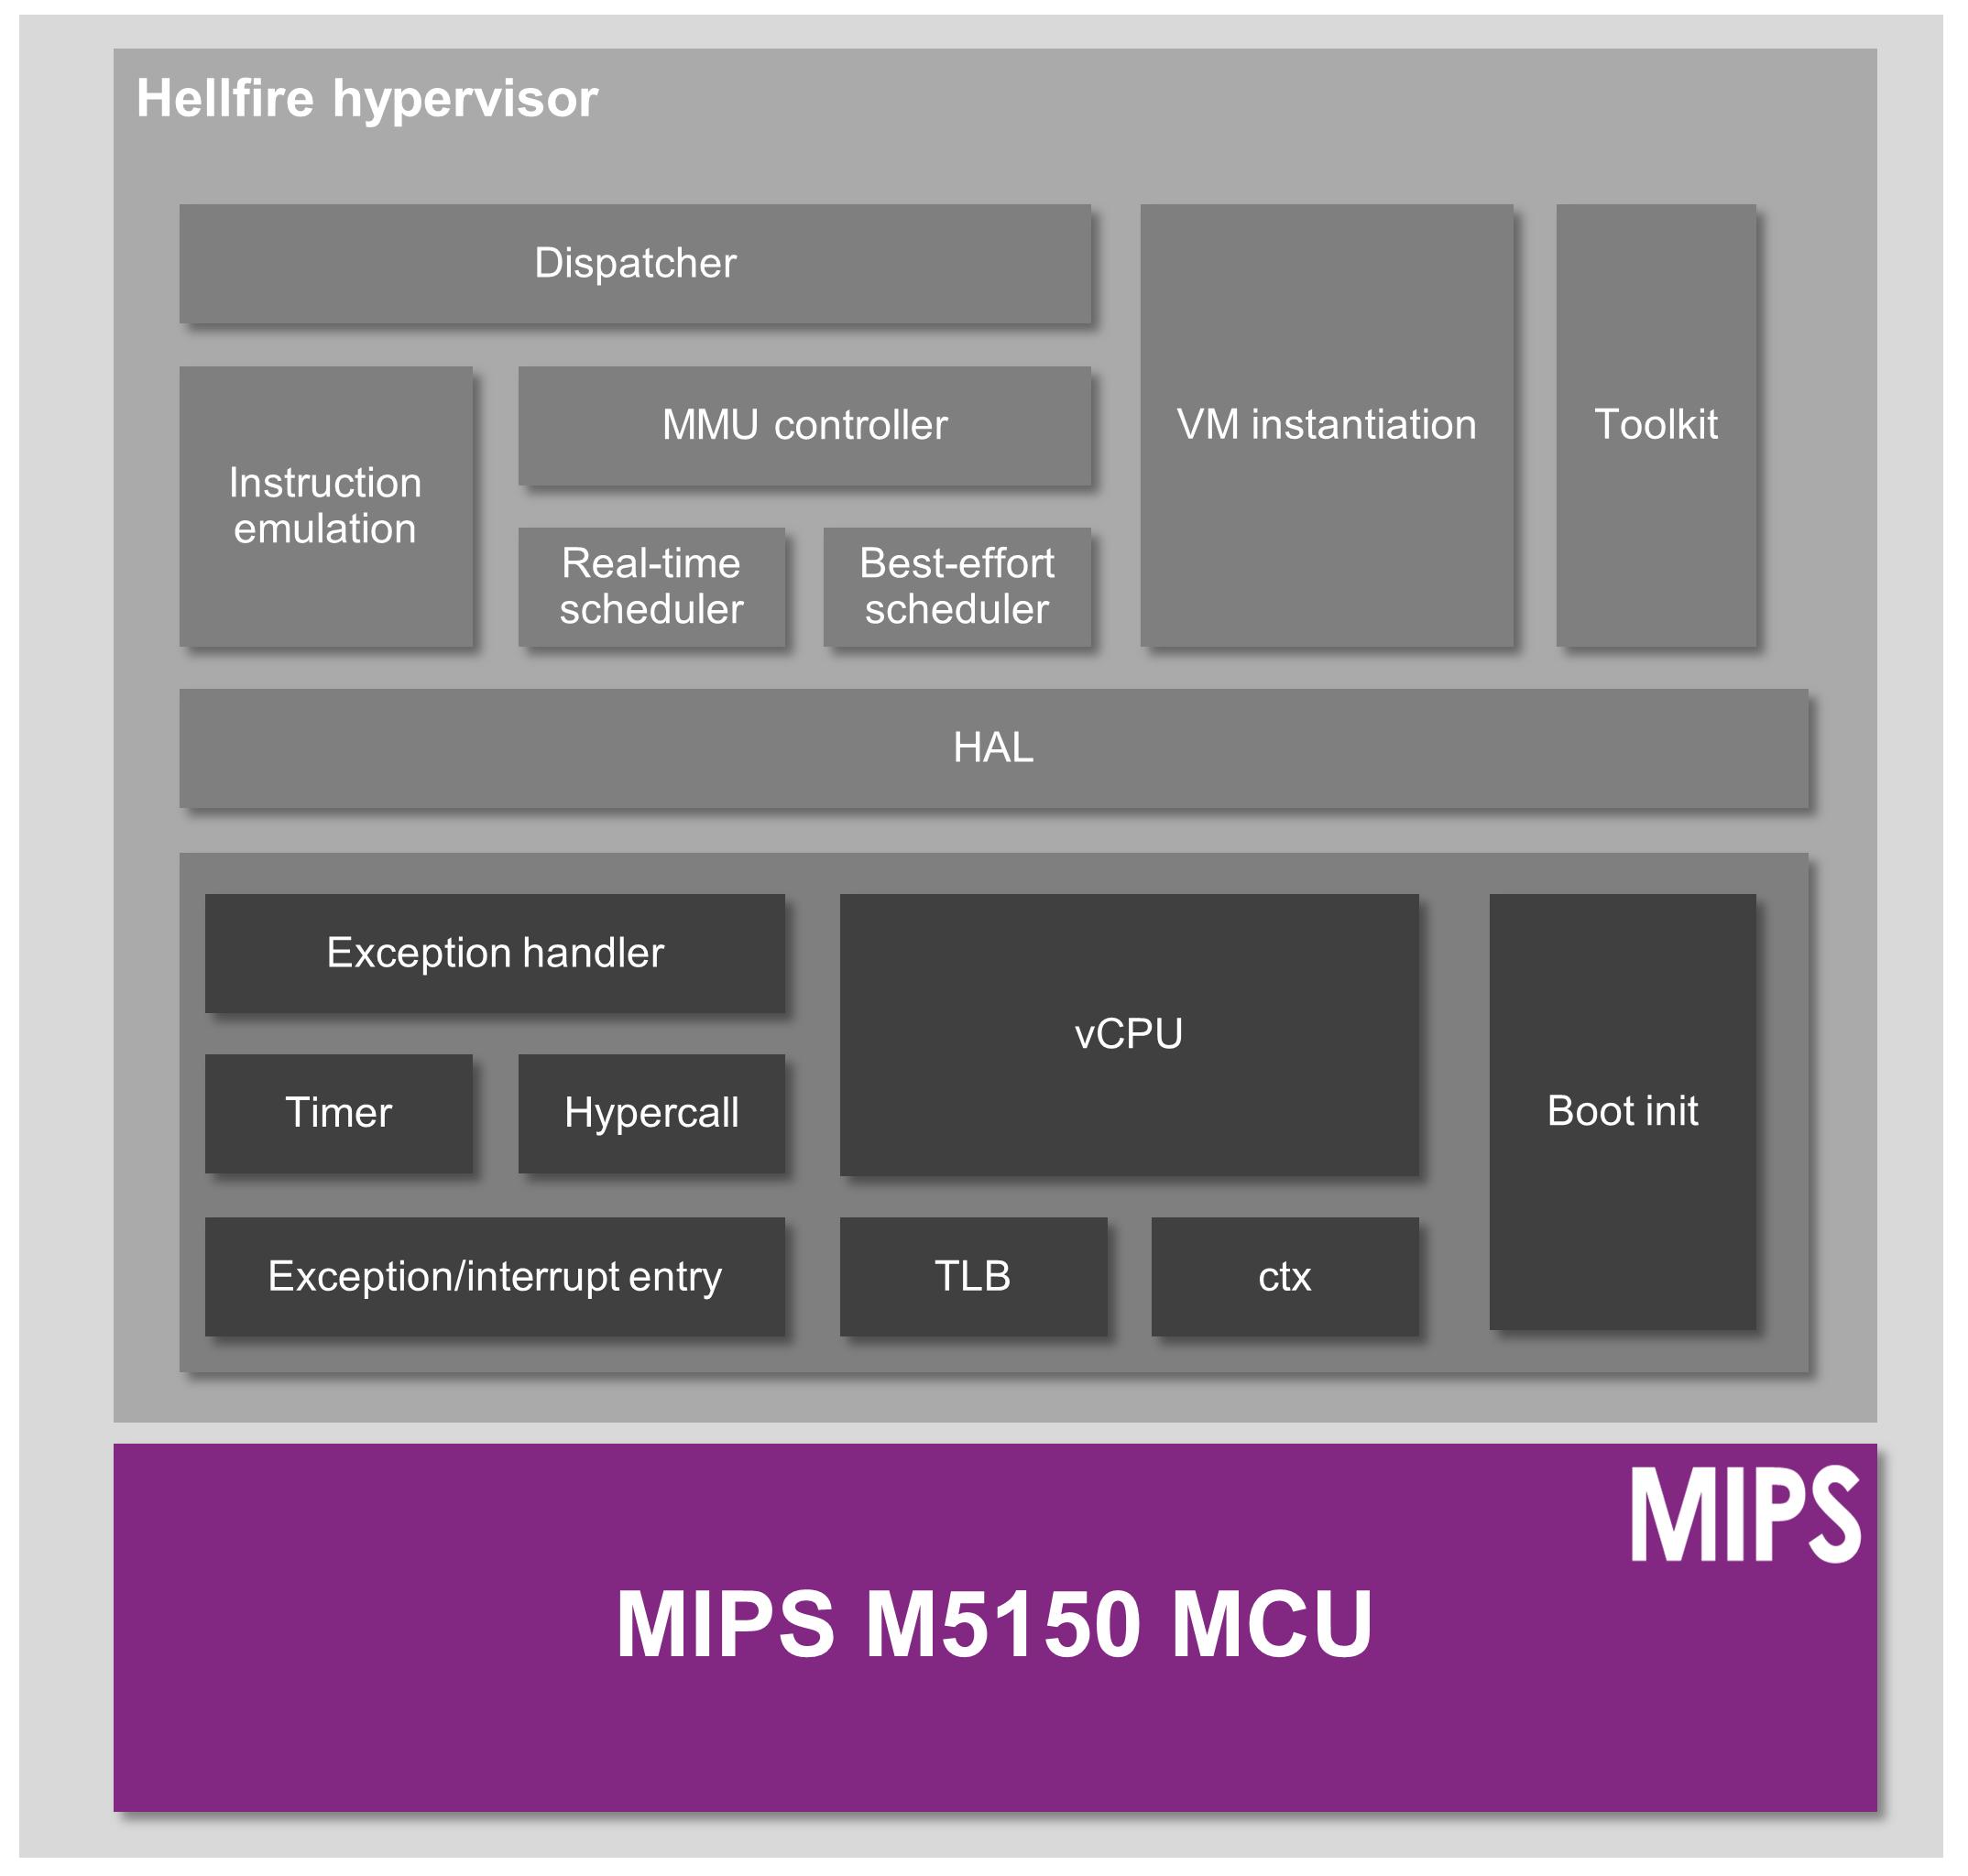 Hellfire hypervisor - architecture